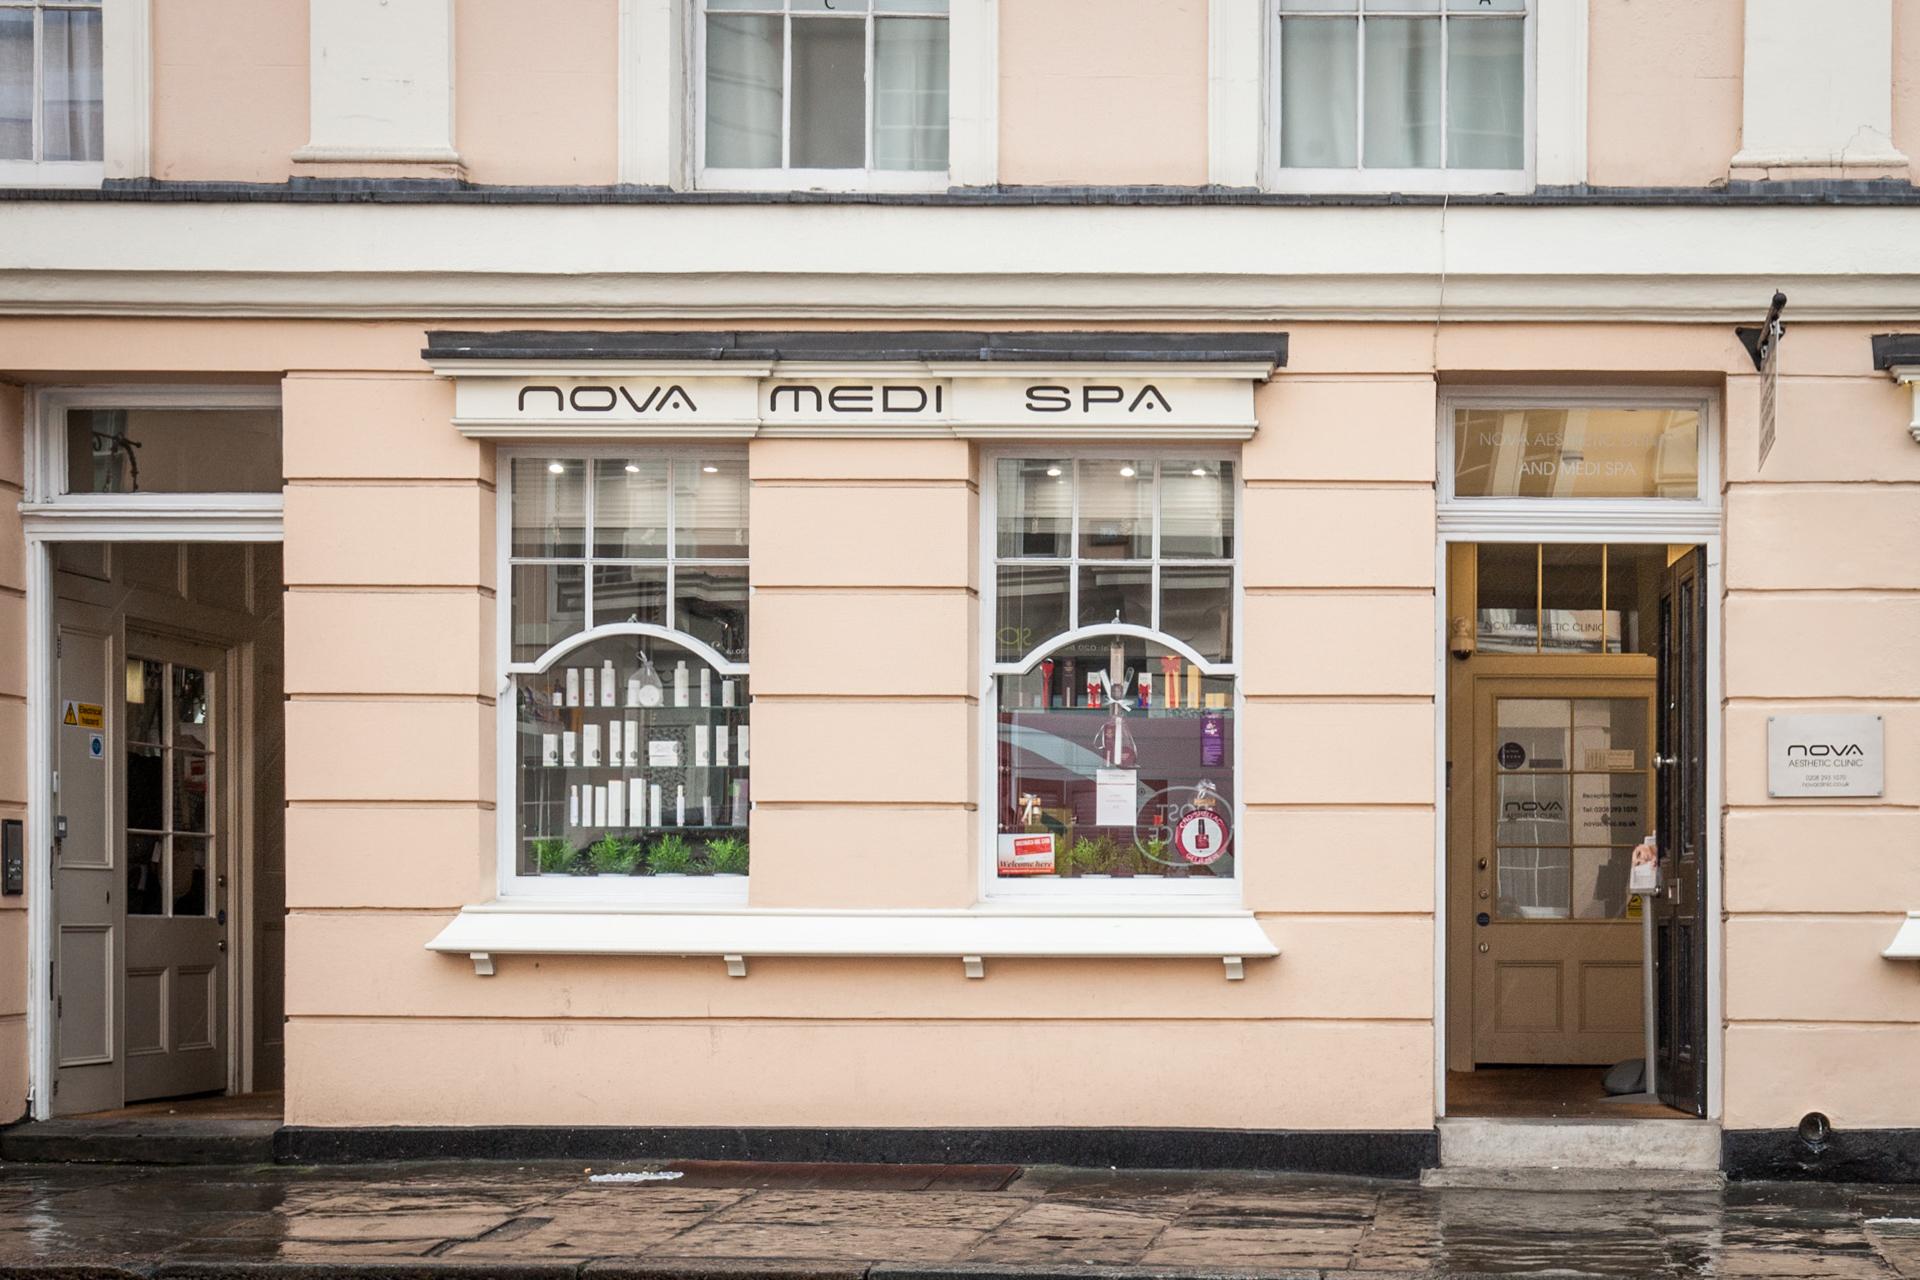 Nova_Aesthetic_Clinic_&_MediSpa_UKD_13.jpg